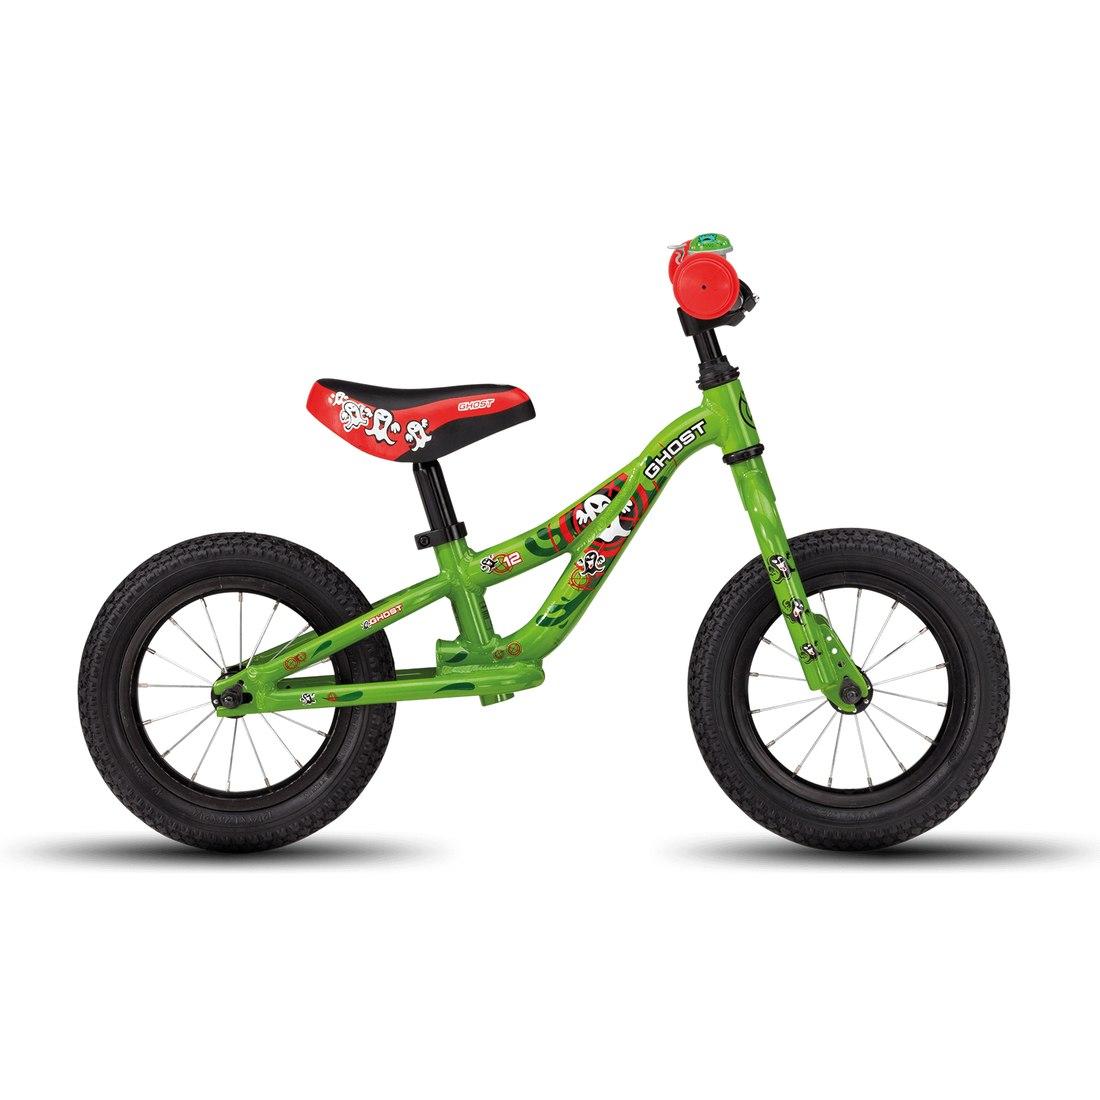 "Image of Ghost POWERKIDDY AL 12 K - 12"" Run Bike - 2020 - riot green / riot red / star white"